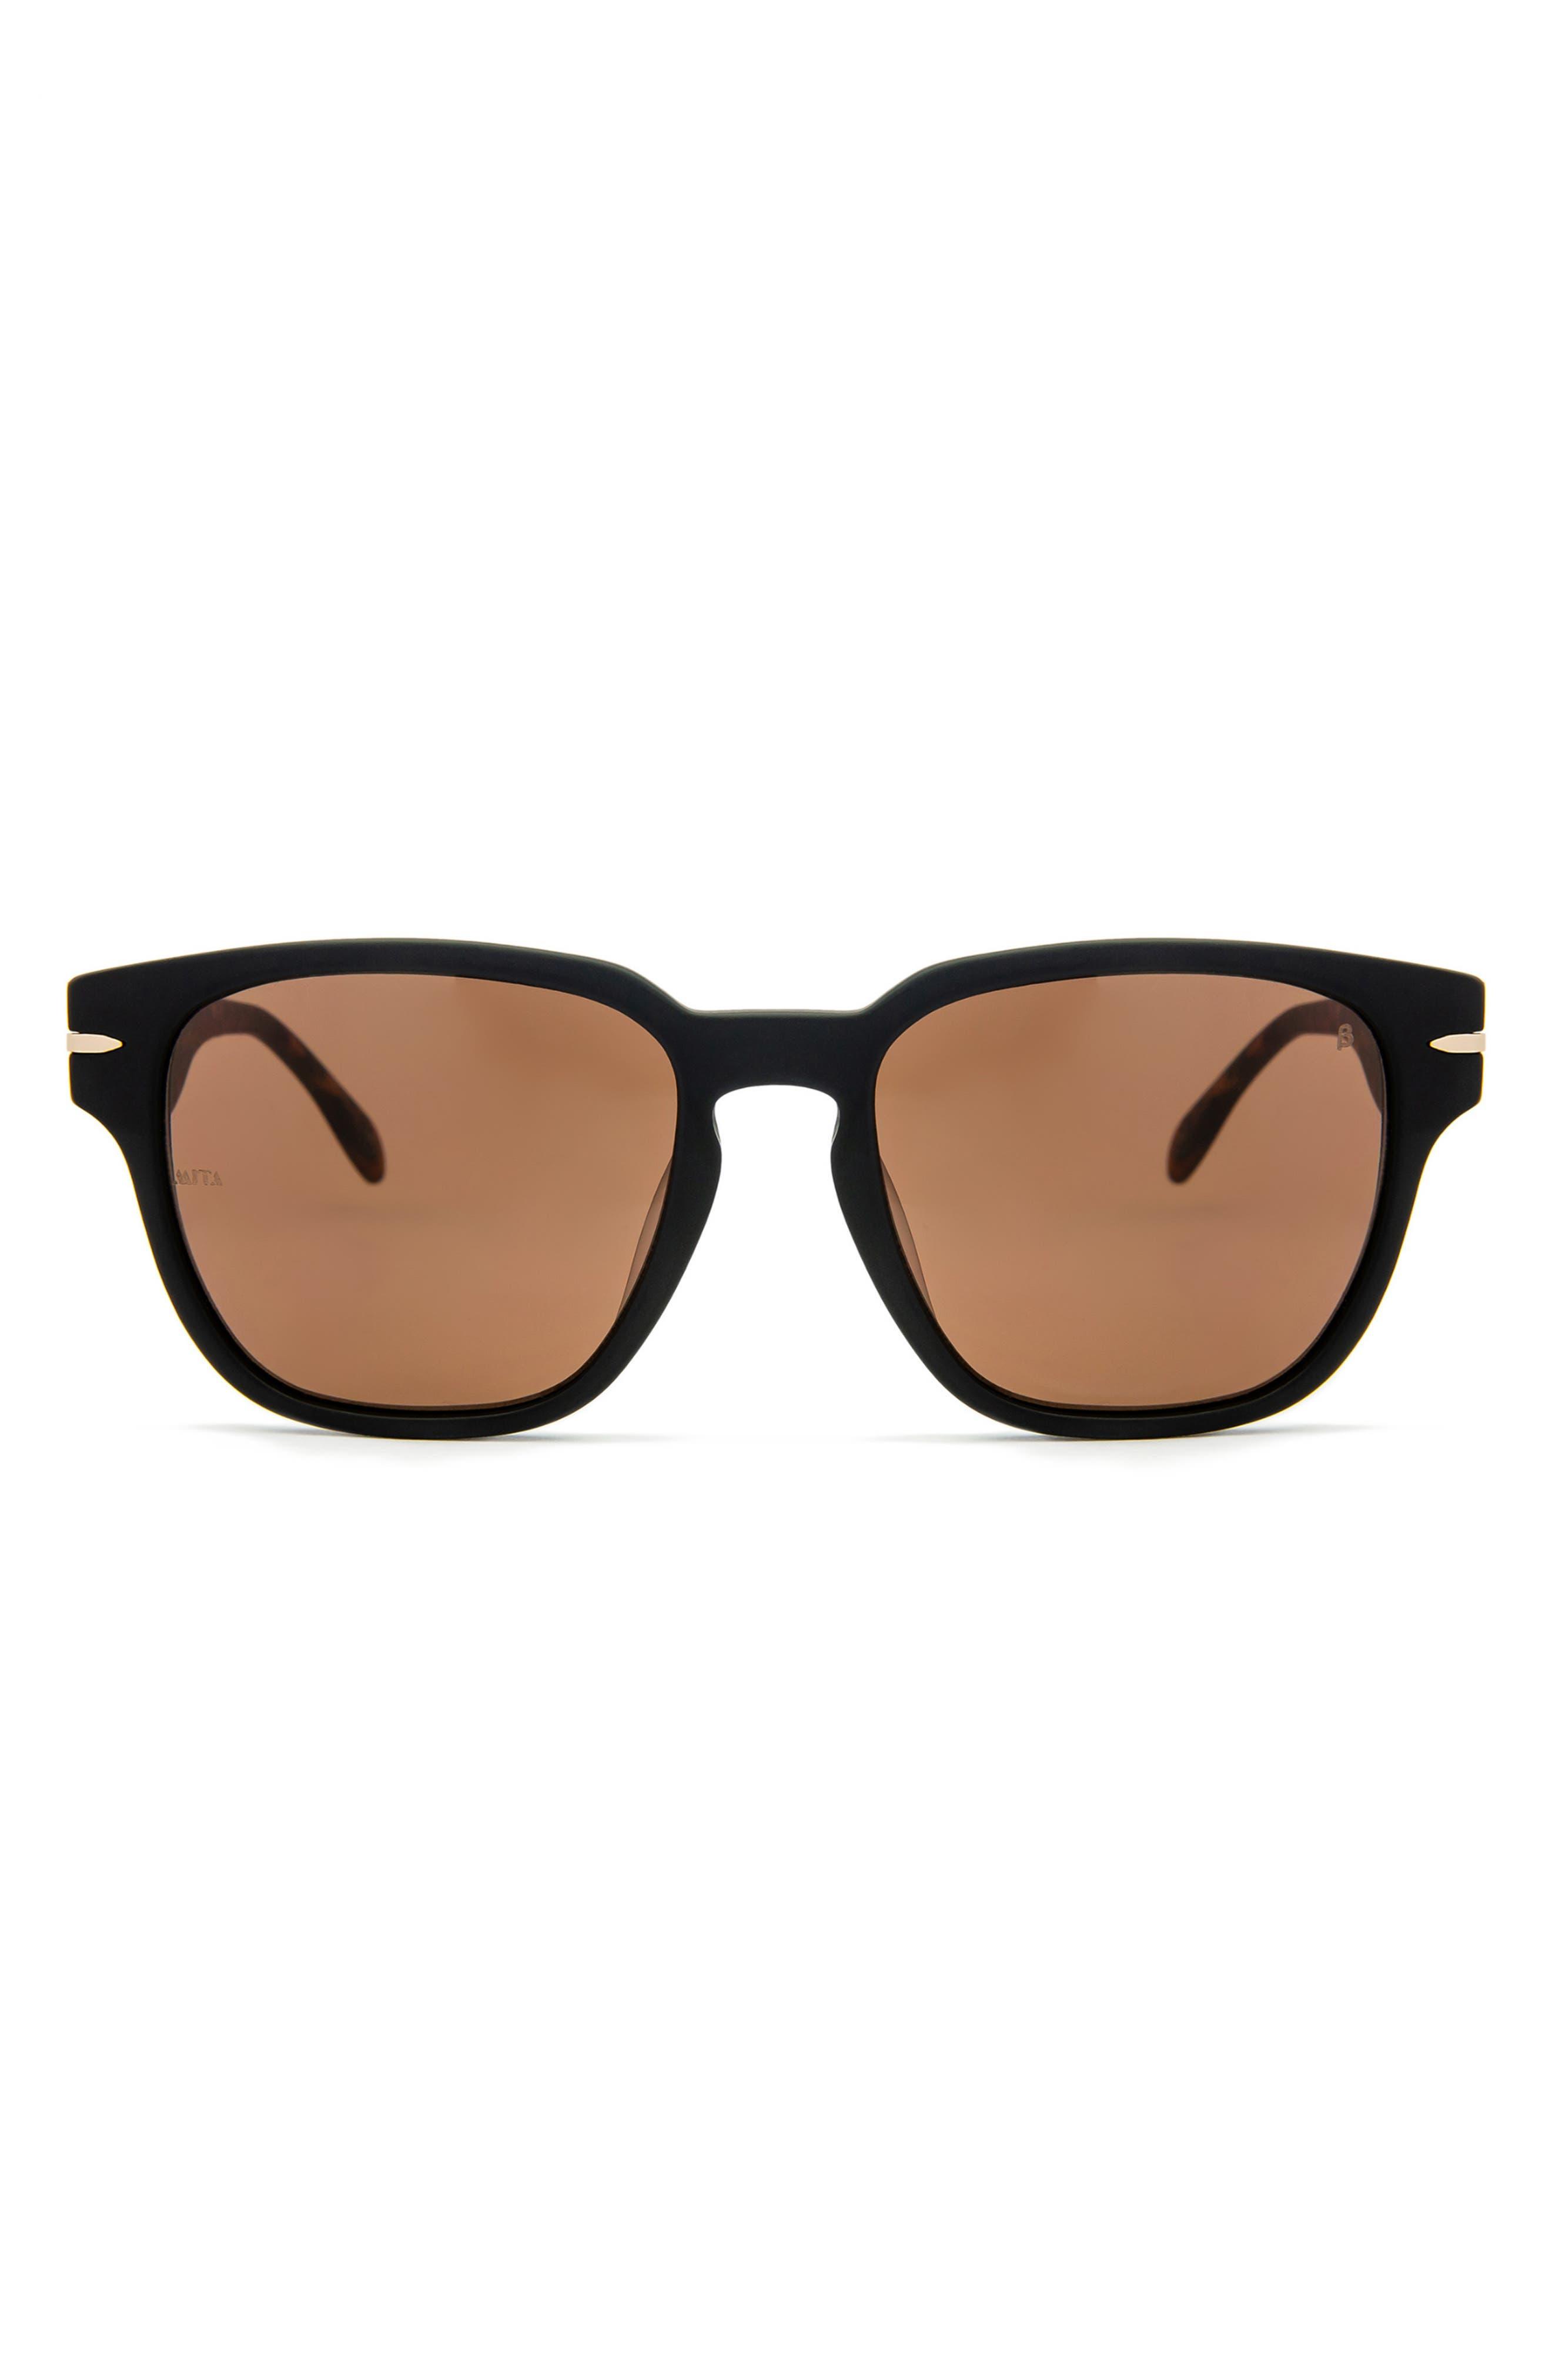 Key West 55mm Square Sunglasses